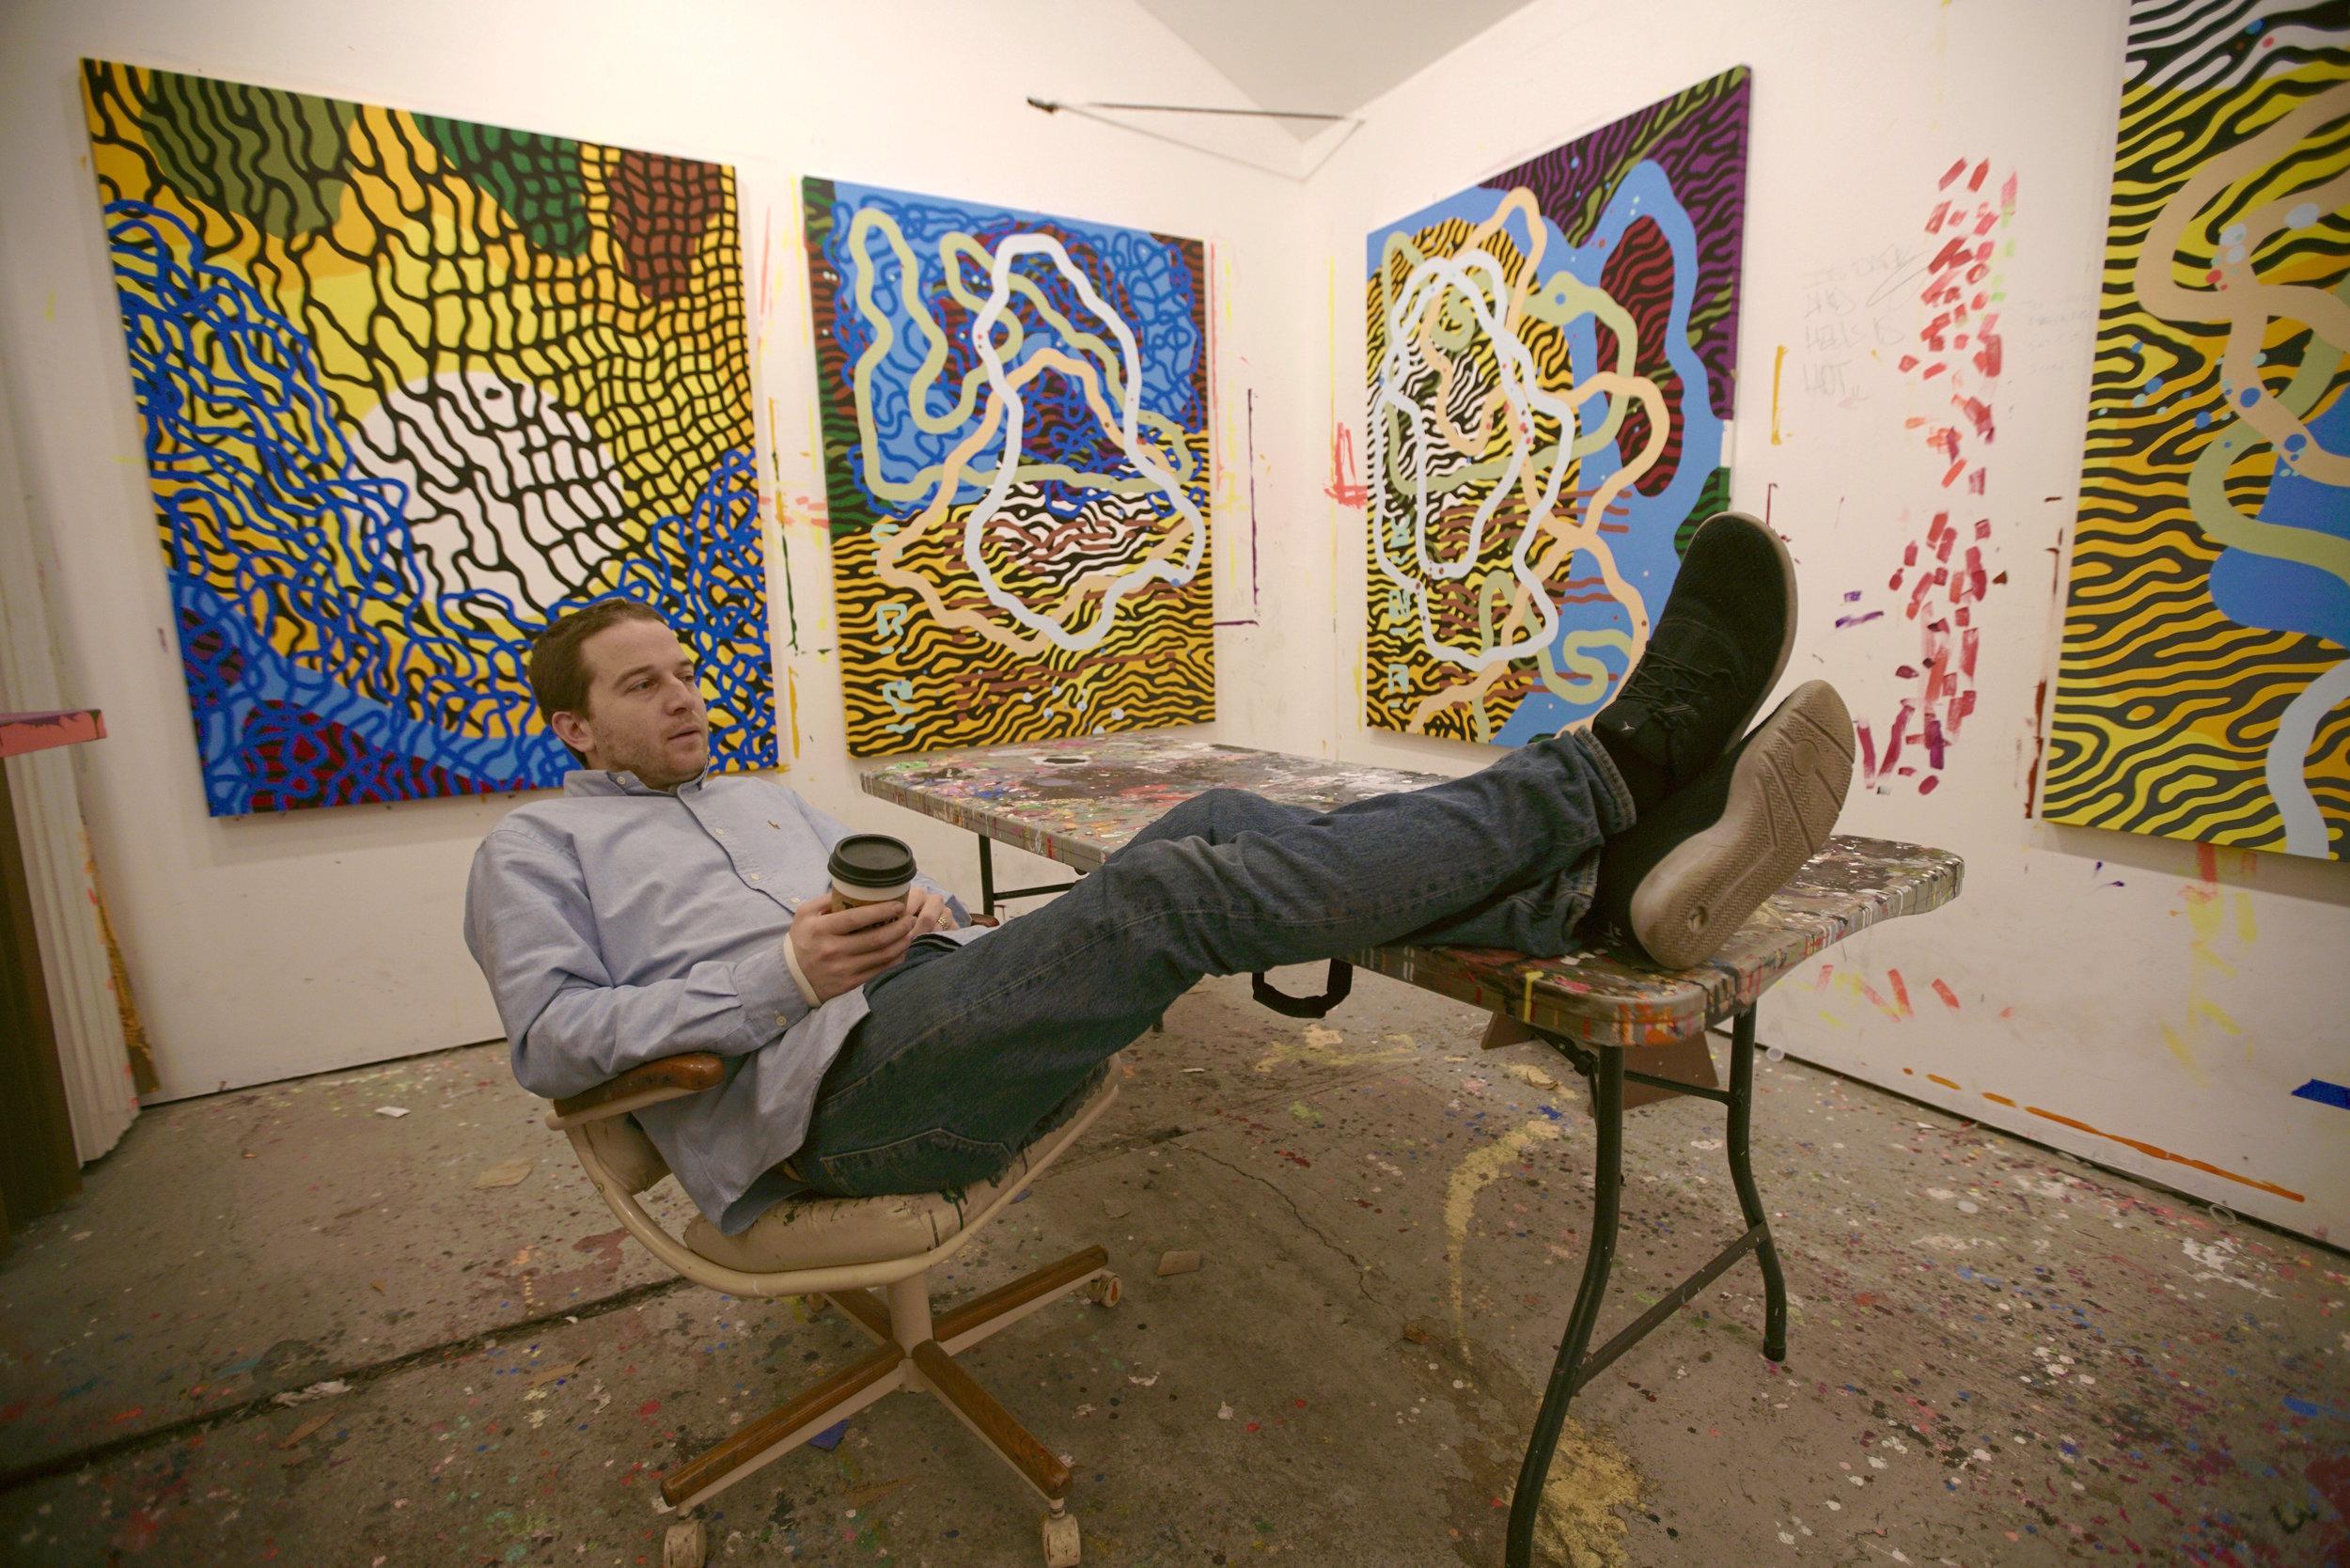 sam friedman art gallery bangkok thailand running